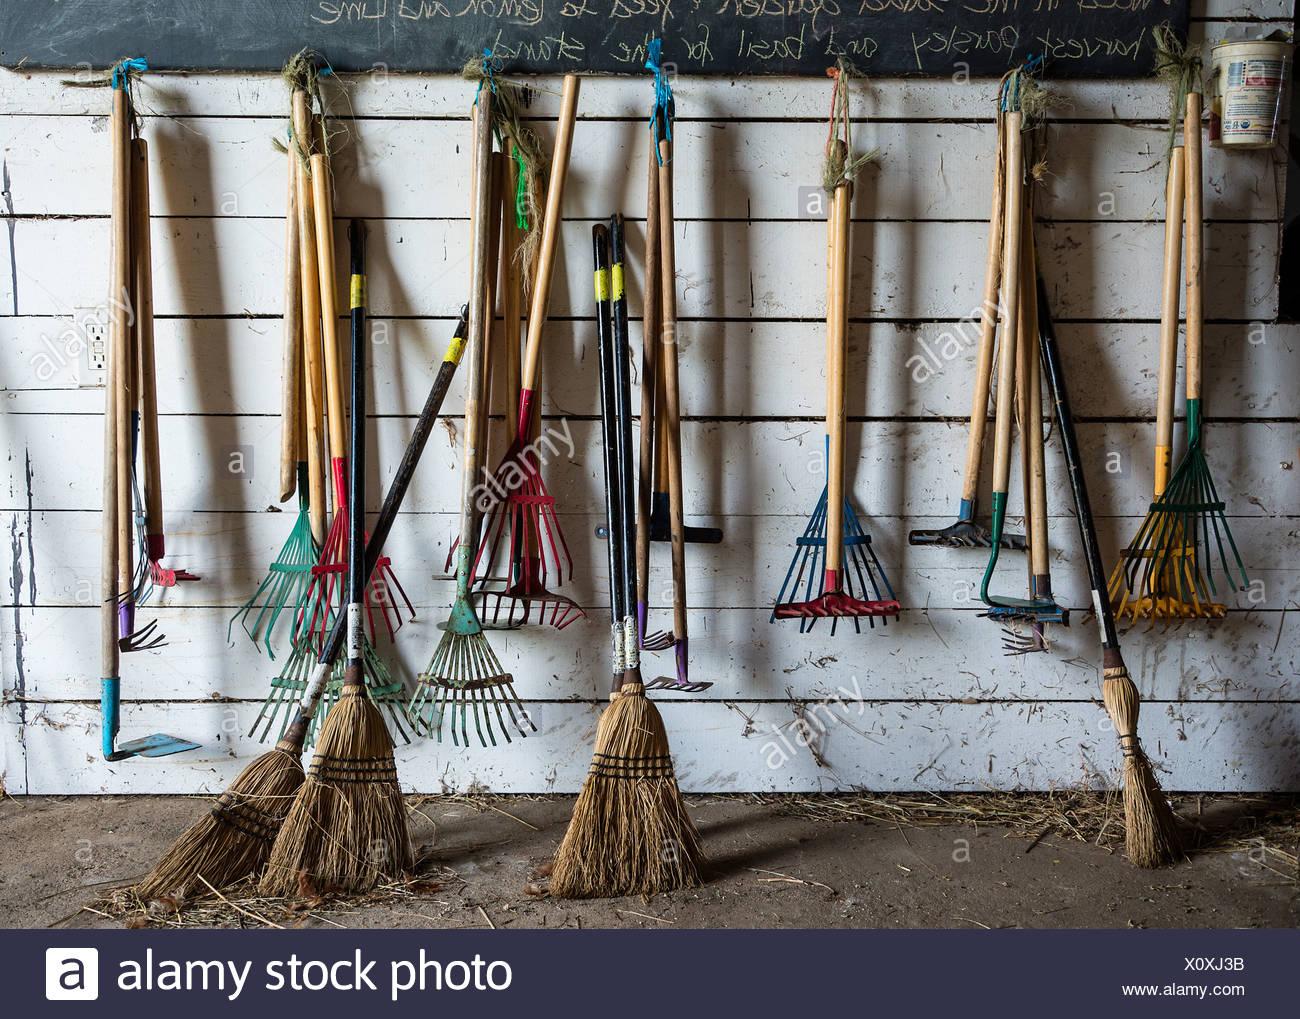 Child sized farm tools. - Stock Image